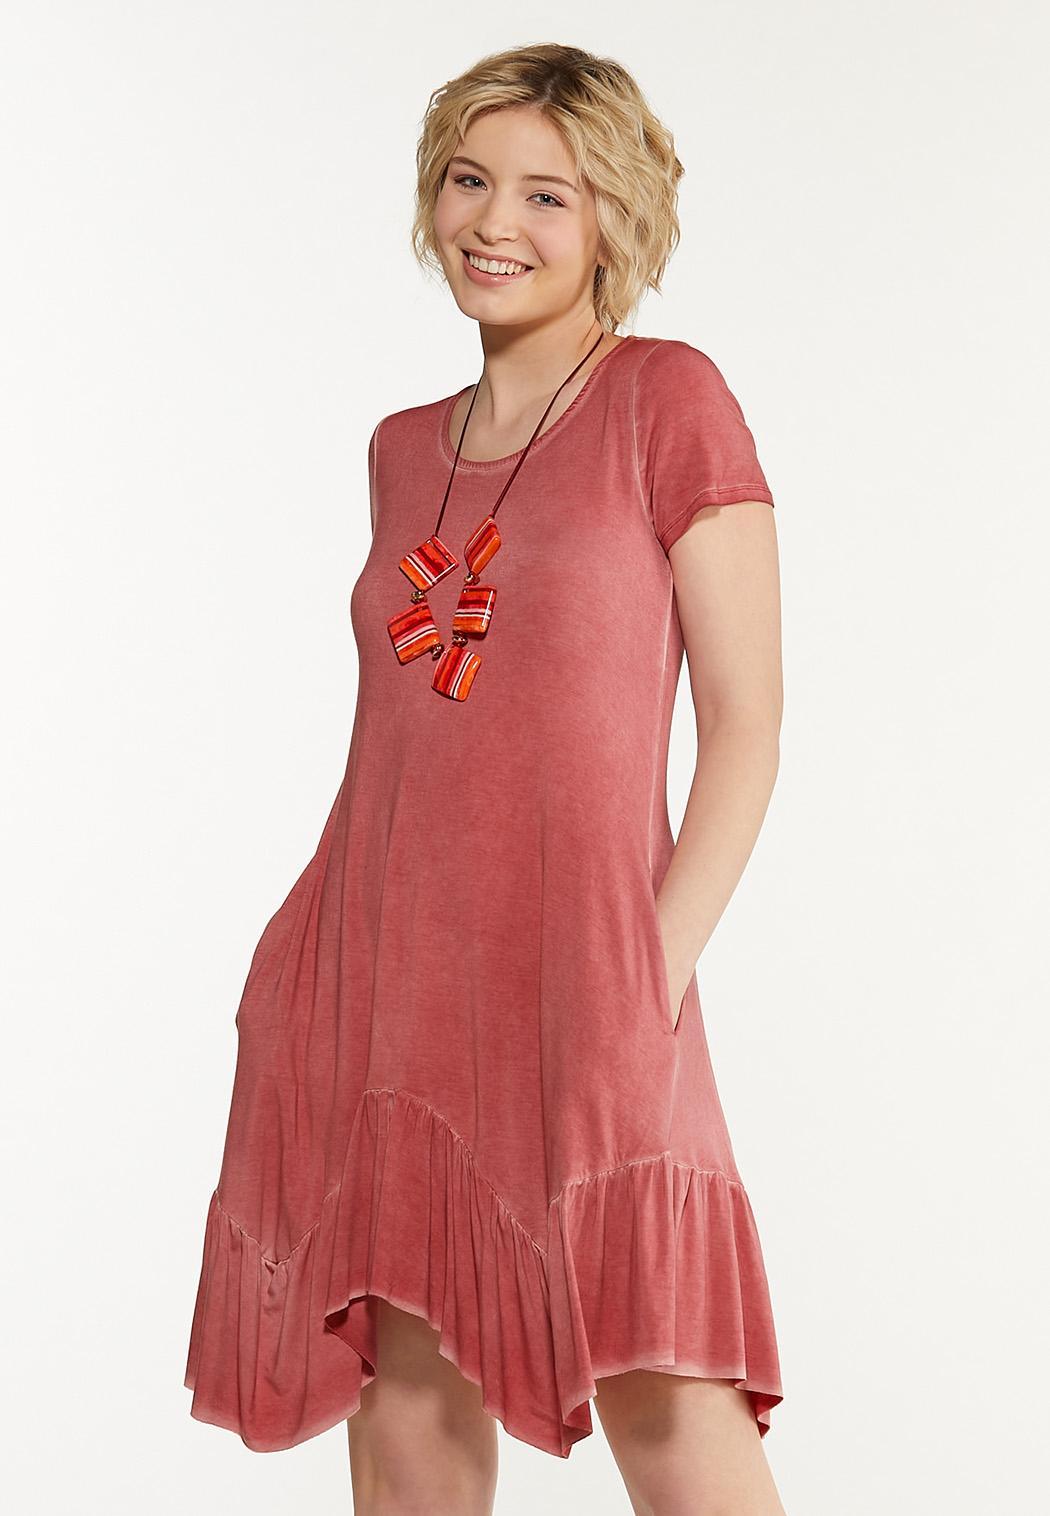 Dyed Garnet Swing Dress